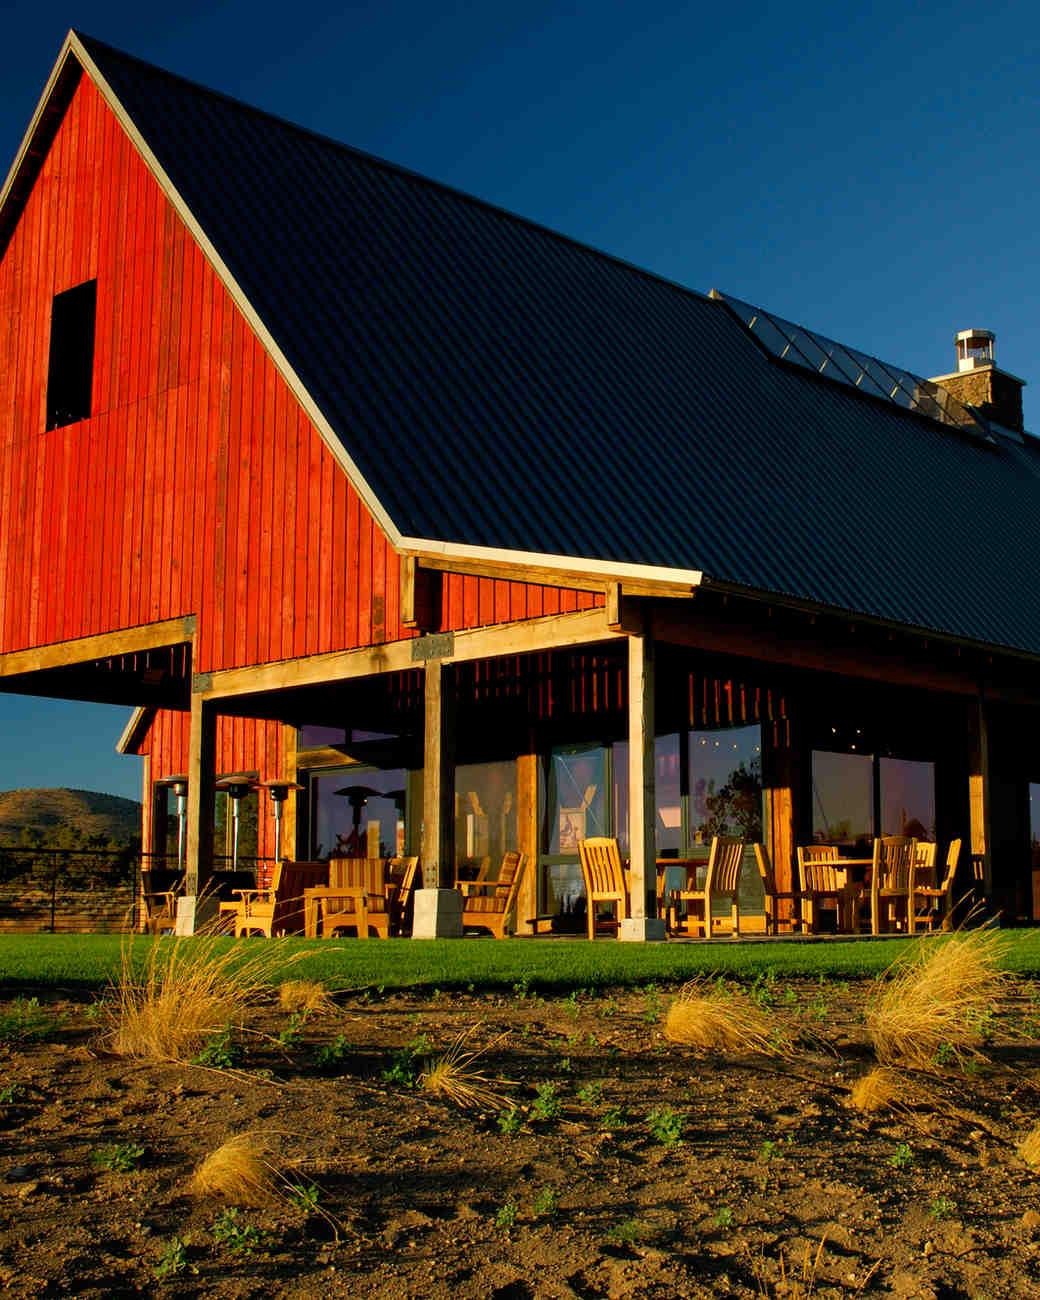 barn-day-msw-travel.jpg